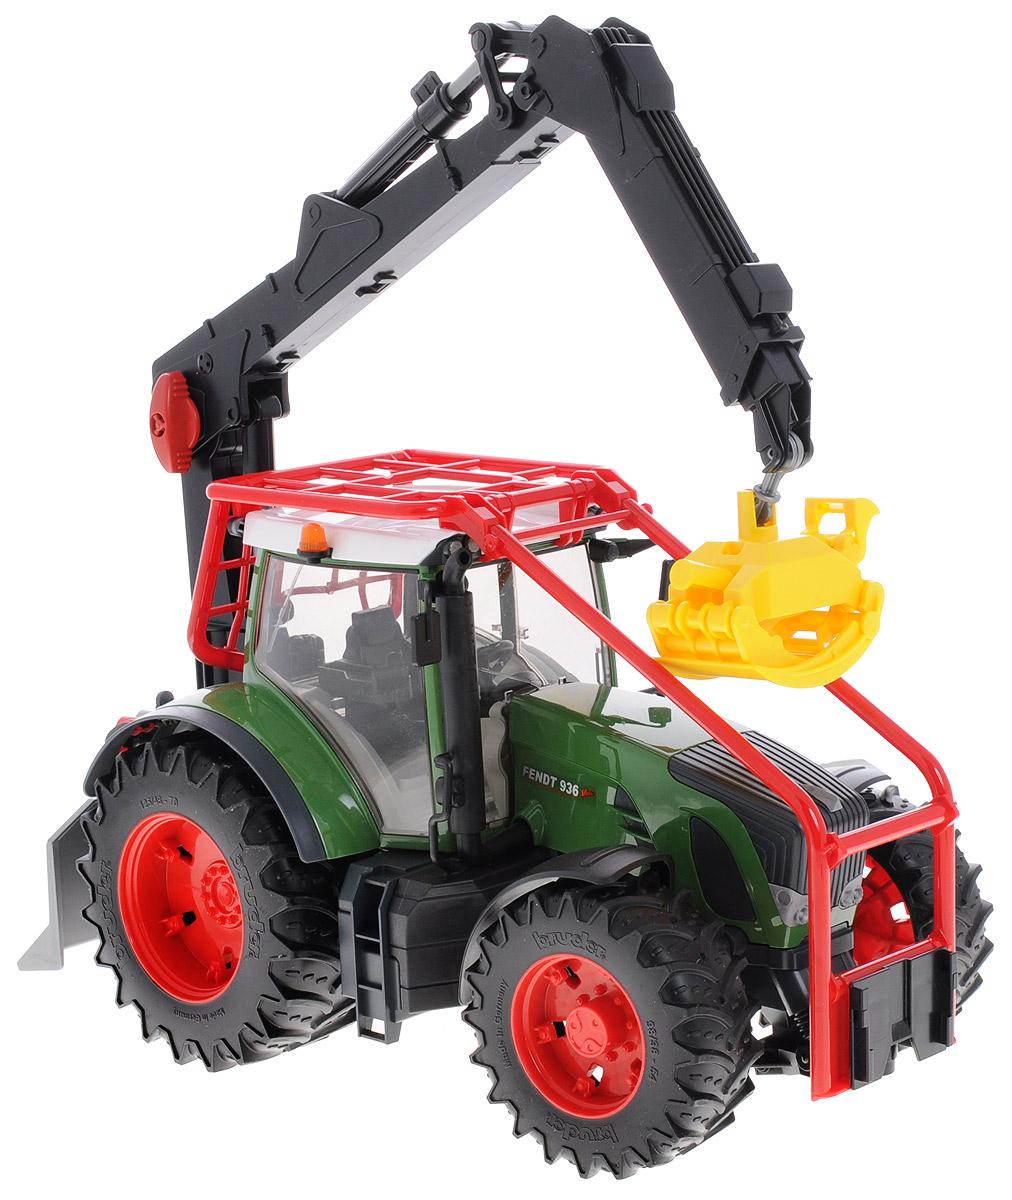 Bruder Трактор Fendt 936 Vario с манипулятором bruder трактор fendt favorit vario с погрузчиком bruder